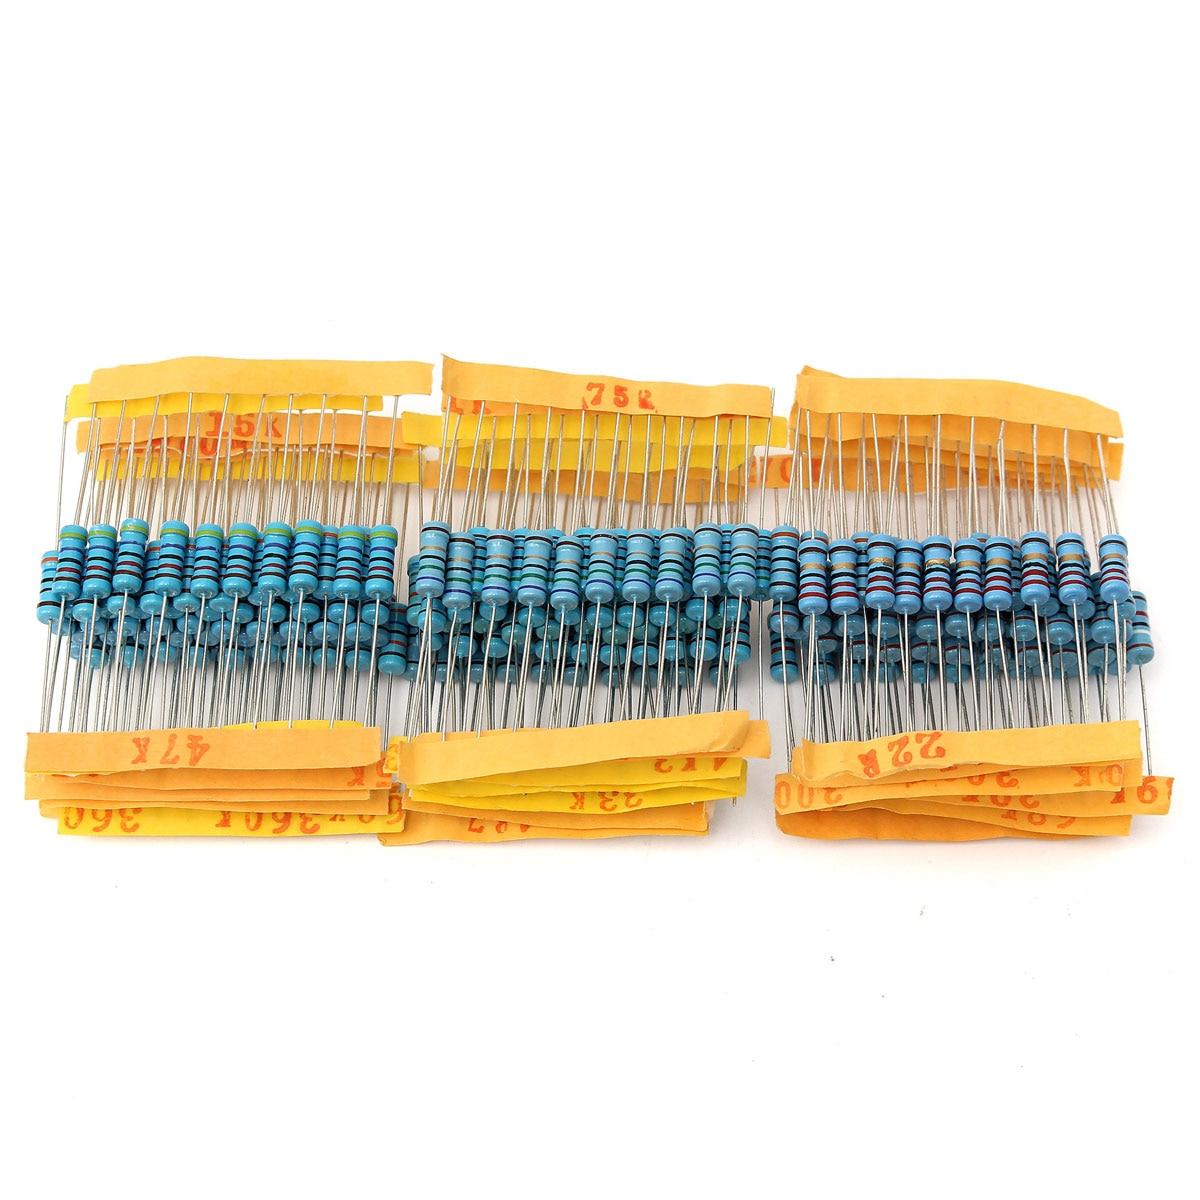 //-1/% Assortment Kit 100value 1000pcs 1W Metal Film Resistor